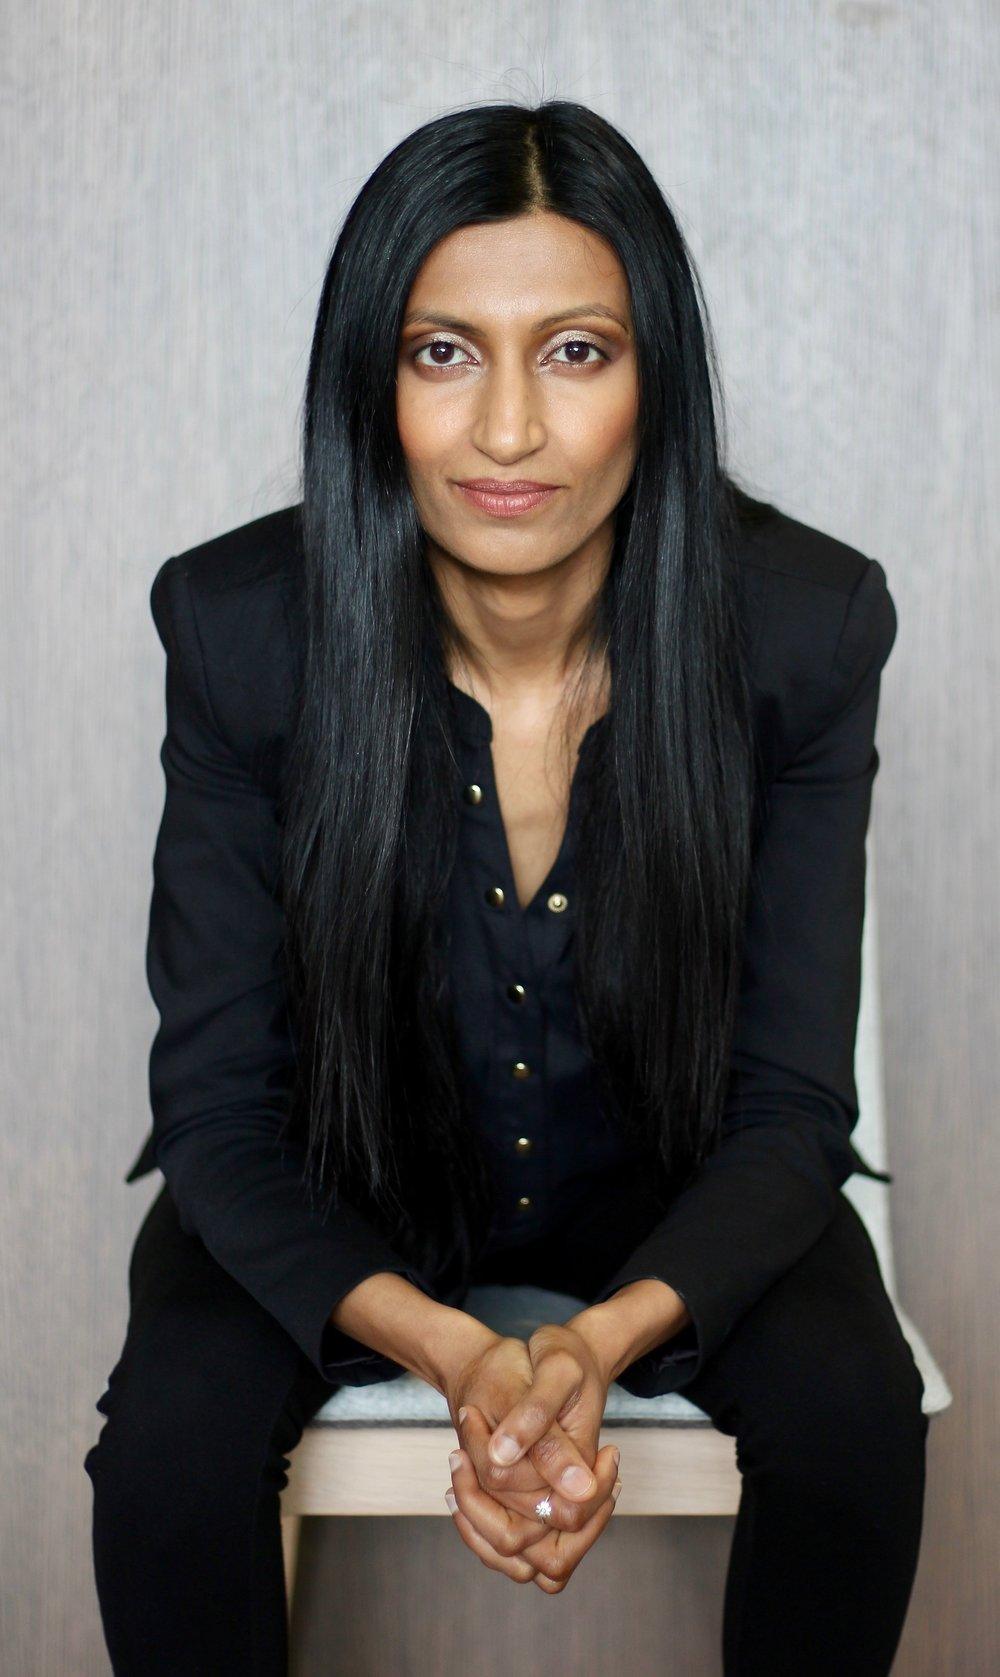 Sunfed Meats founder Shama Lee.